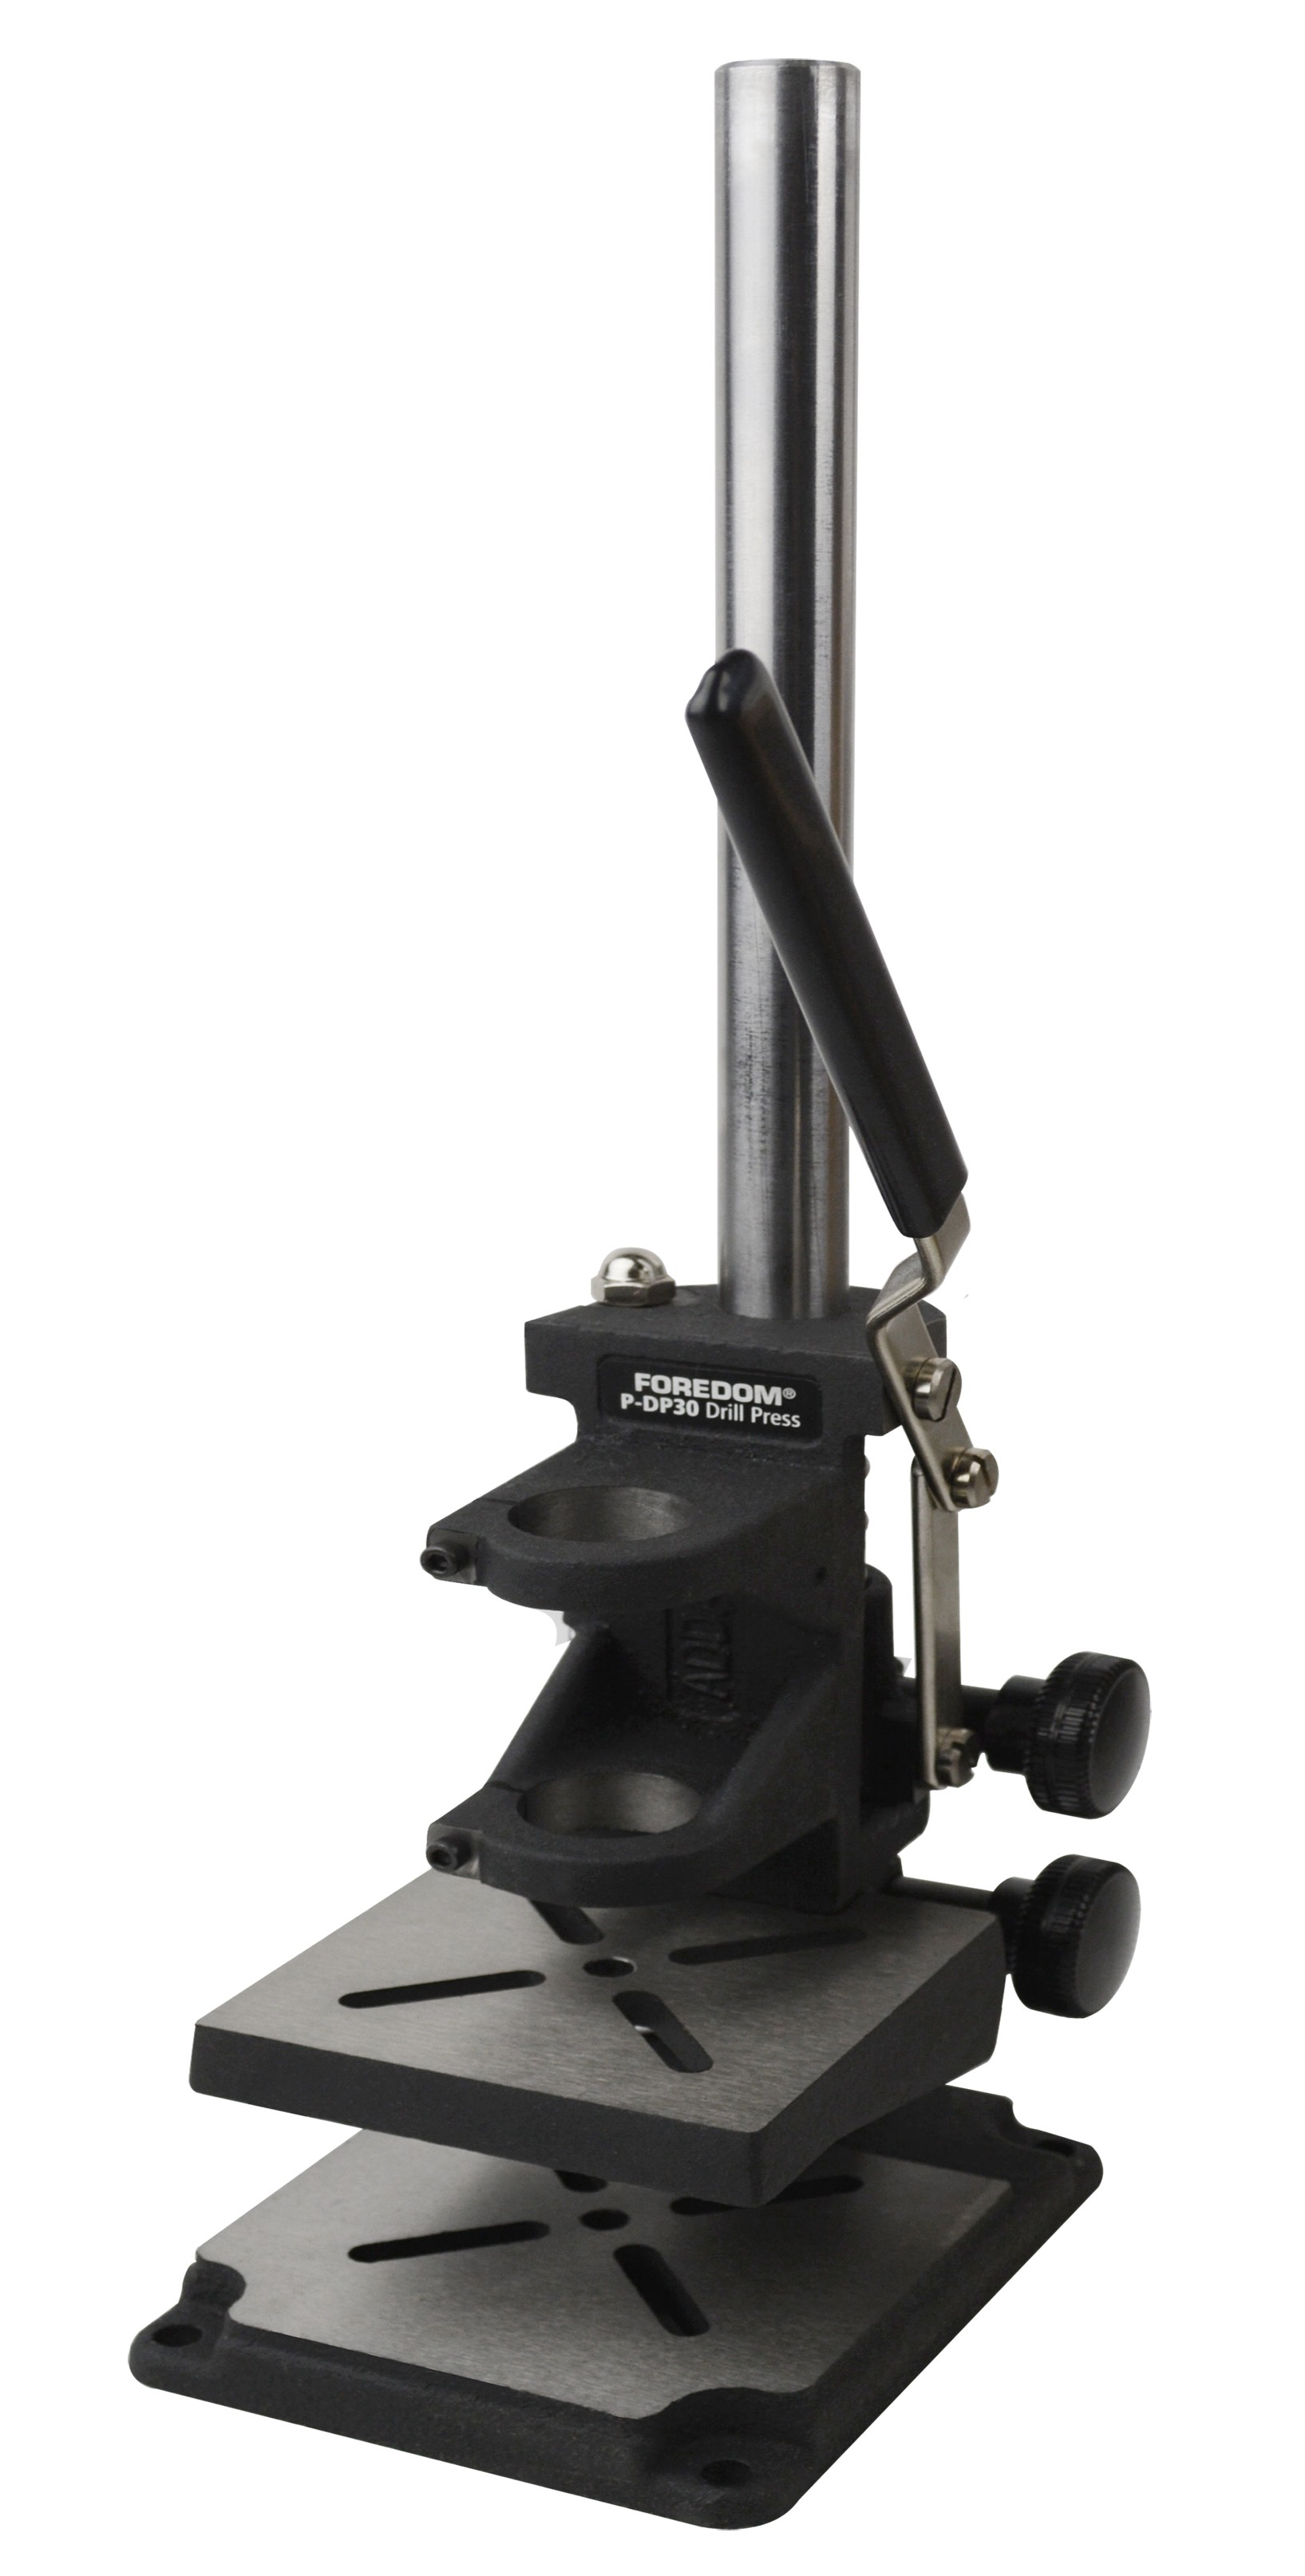 Foredom® Drill Press - P-DP30